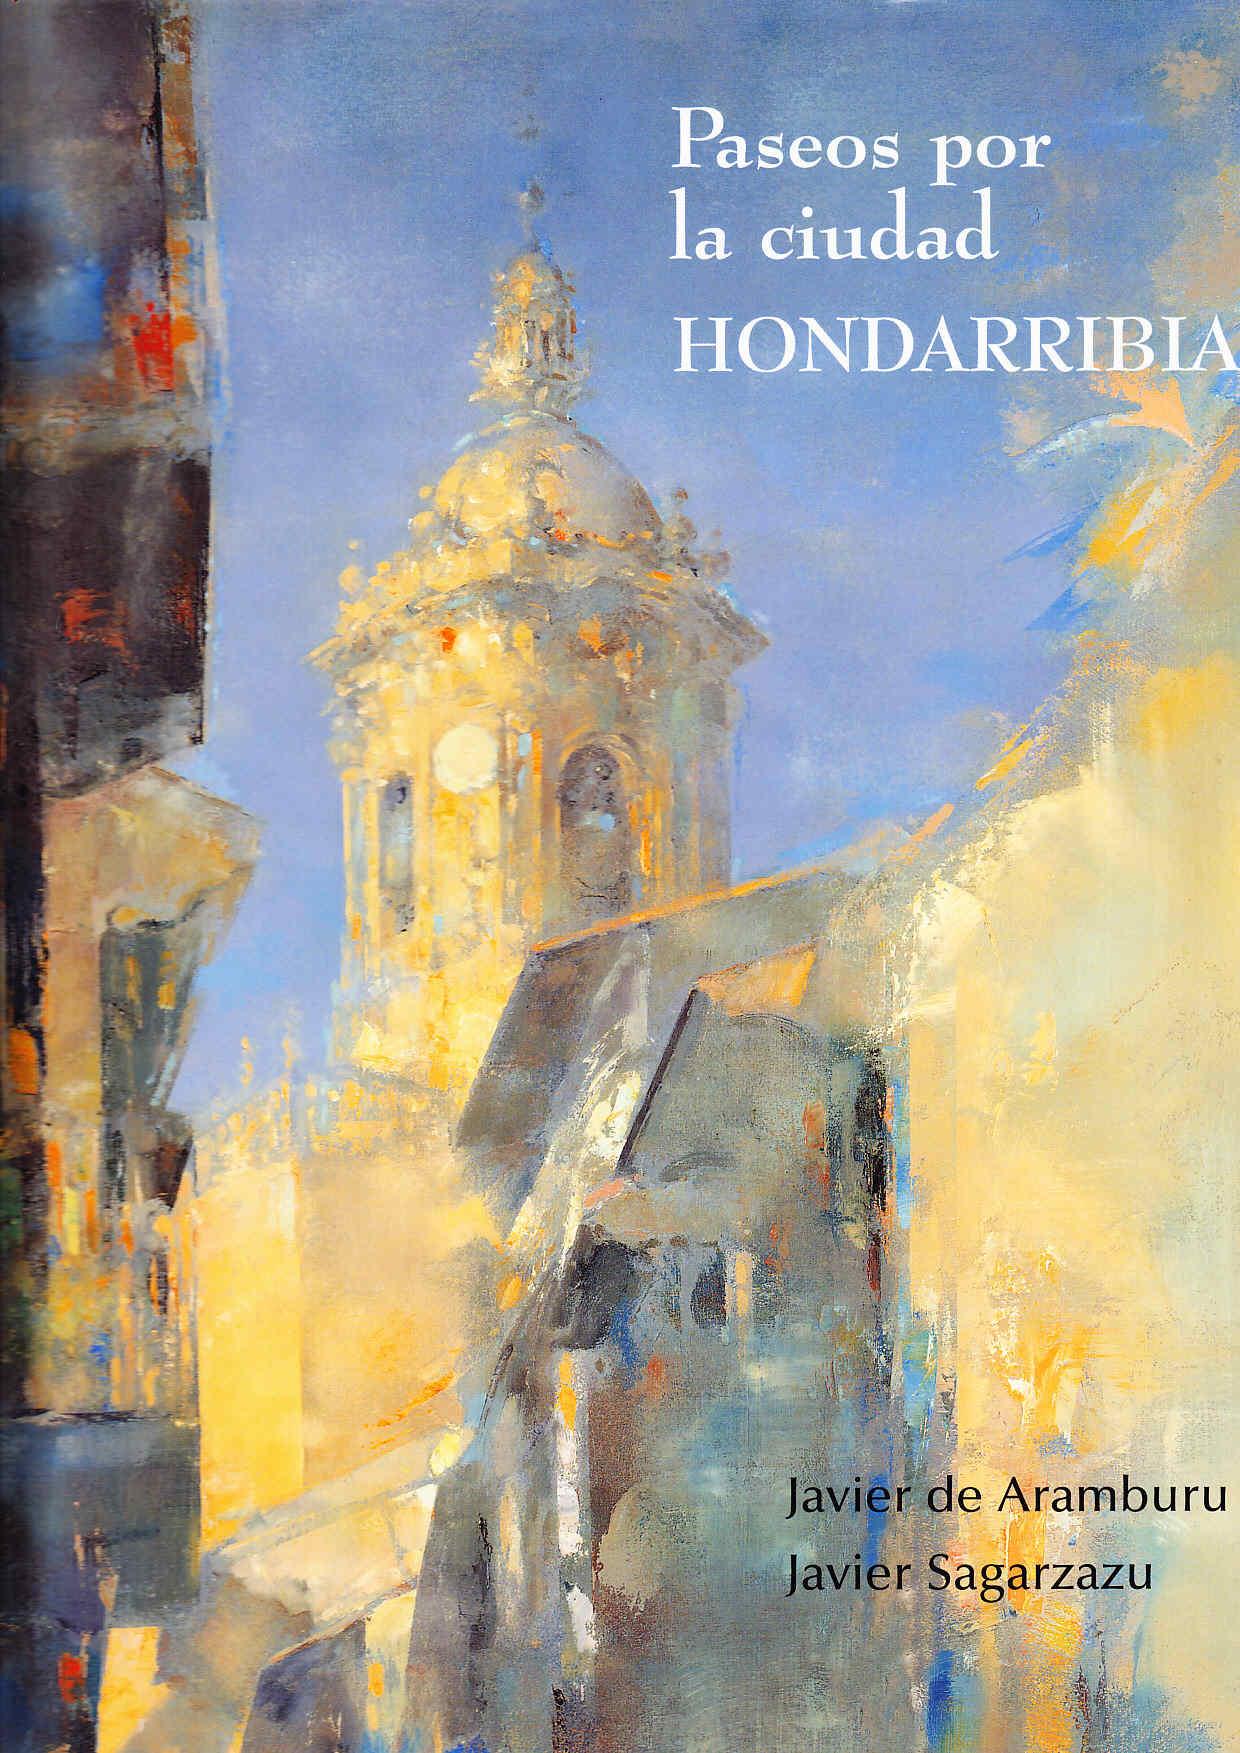 Libro de Javier Sagarzazu sobre Fuenterrabía Hondarribia